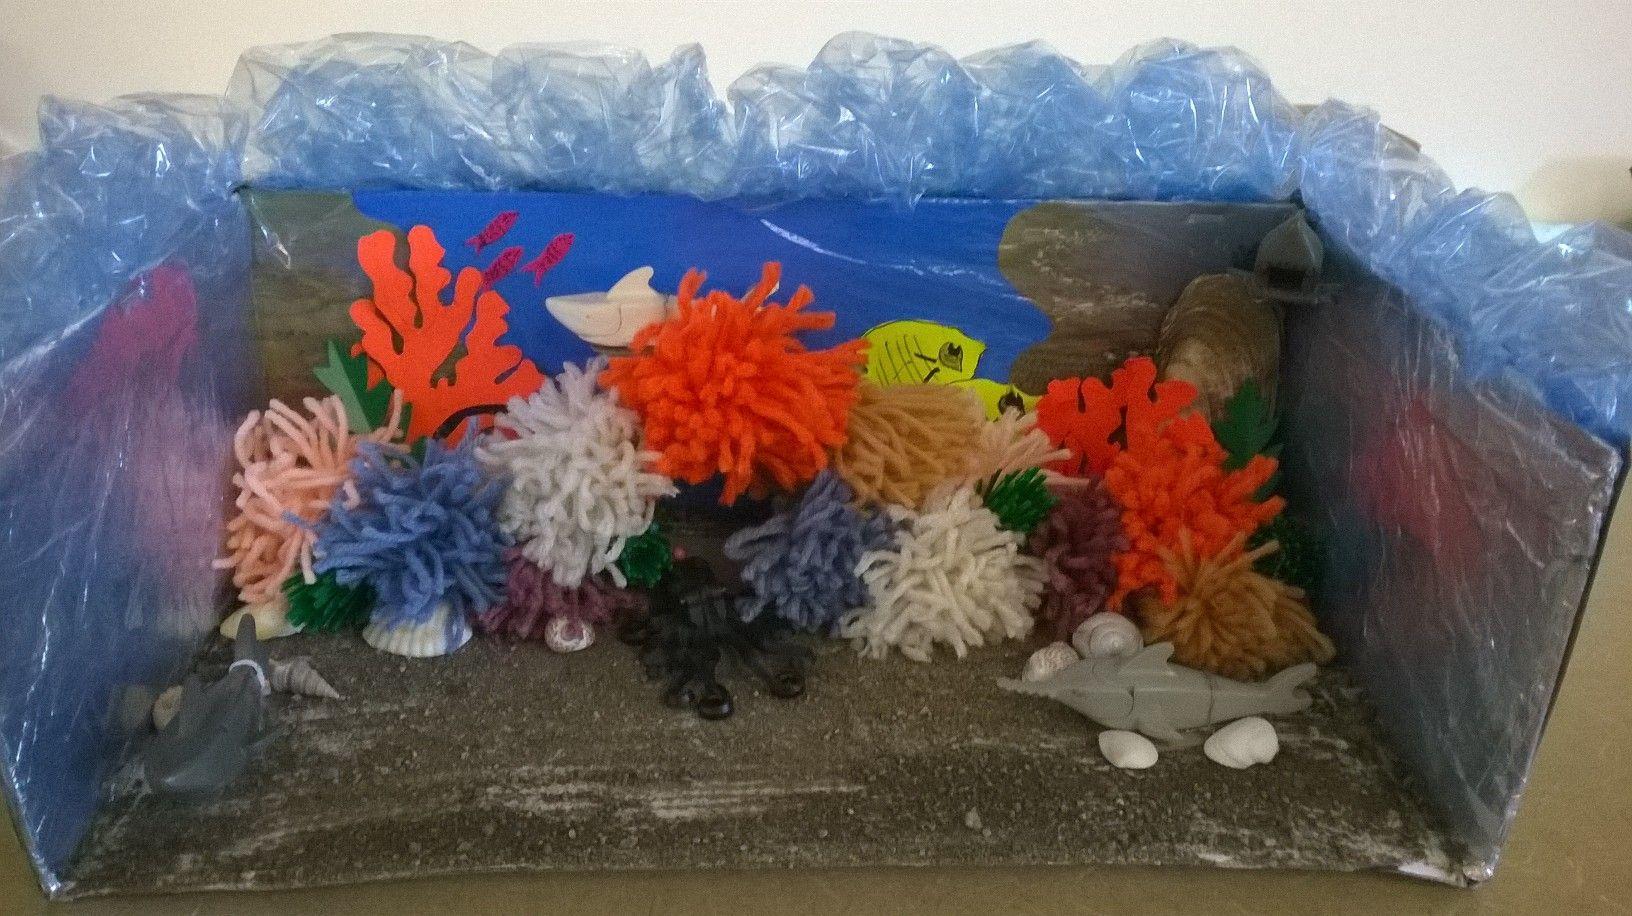 A Diorama Of Australia S Great Barrier Reefs Can Be Used In Art For Kindergarteners To Explore Water Colors Lit Kindergarten Art School Projects Ocean Diorama